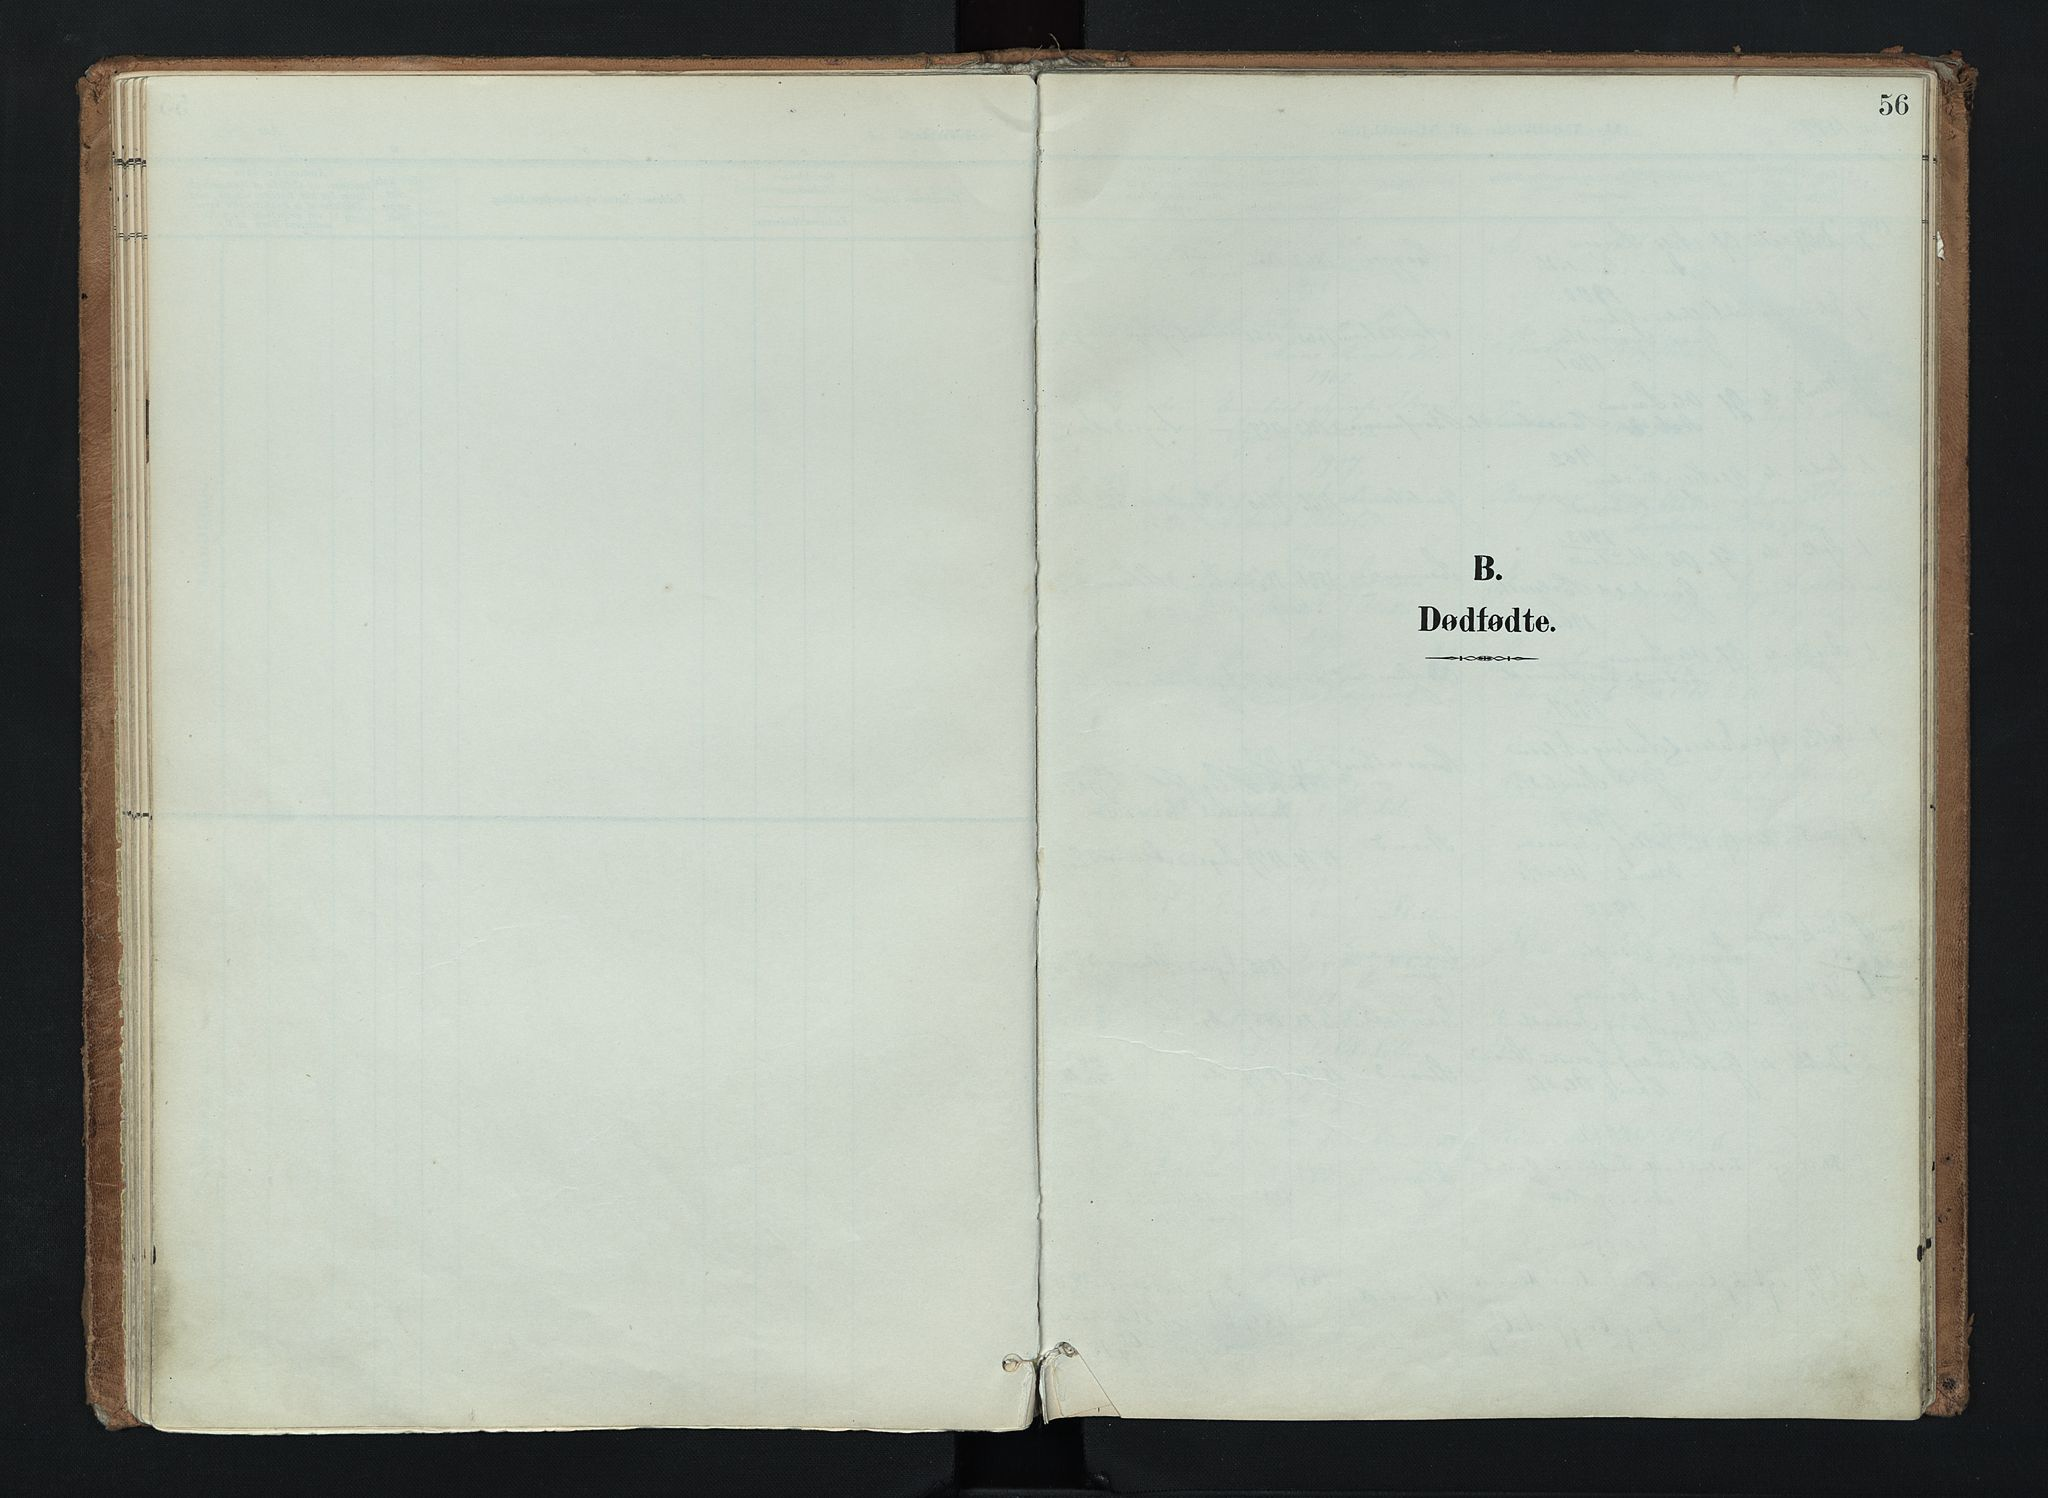 SAH, Nord-Aurdal prestekontor, Ministerialbok nr. 16, 1897-1925, s. 56